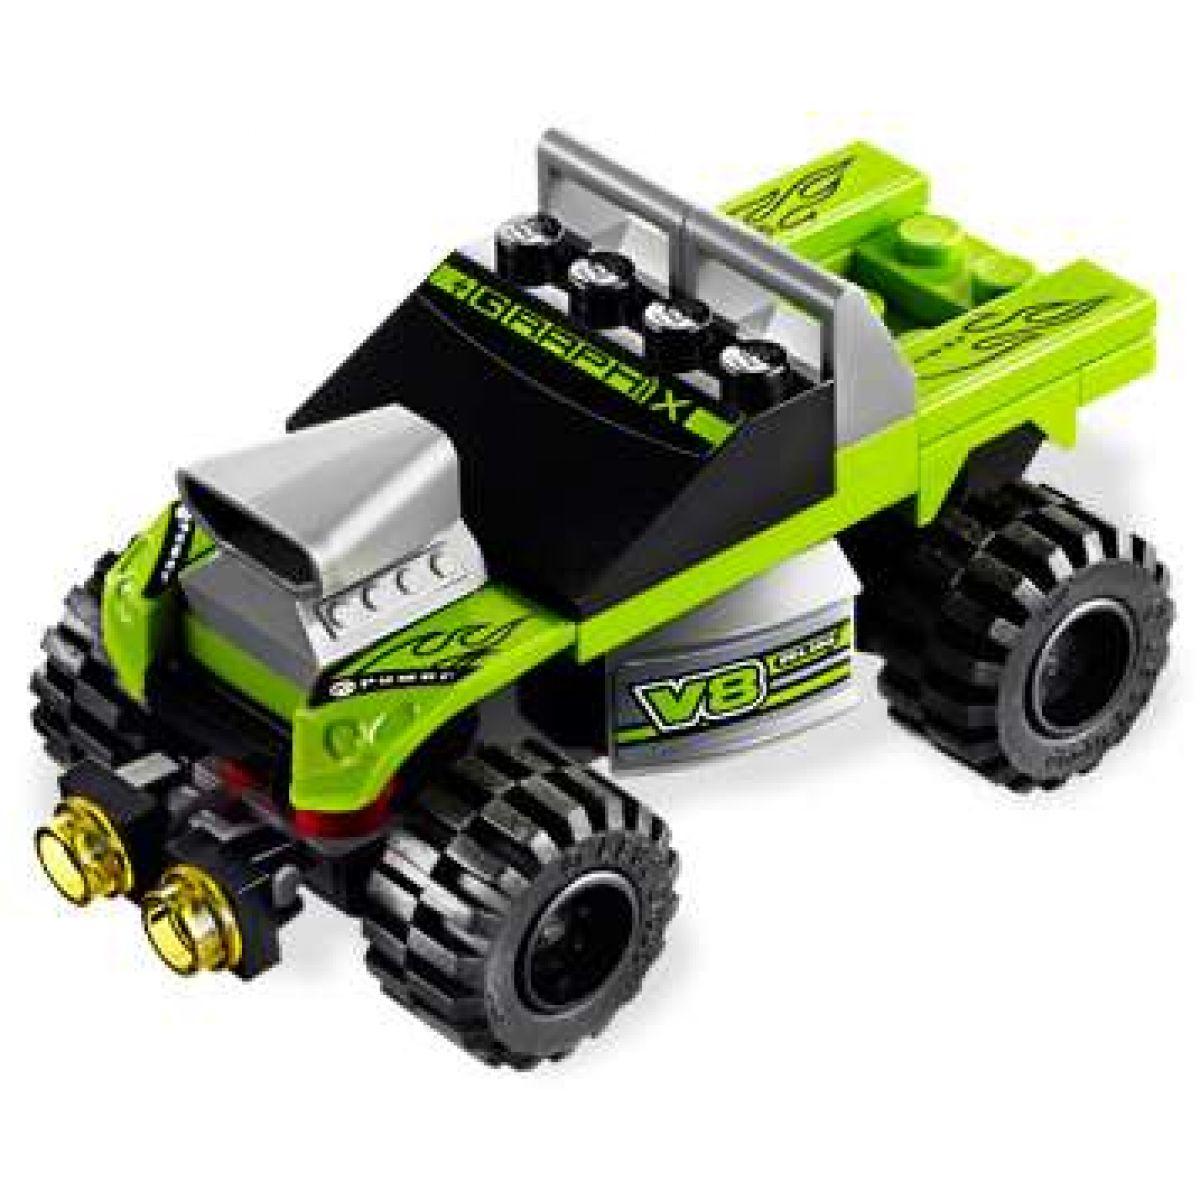 LEGO RACERS 8192 Zelený závoďák